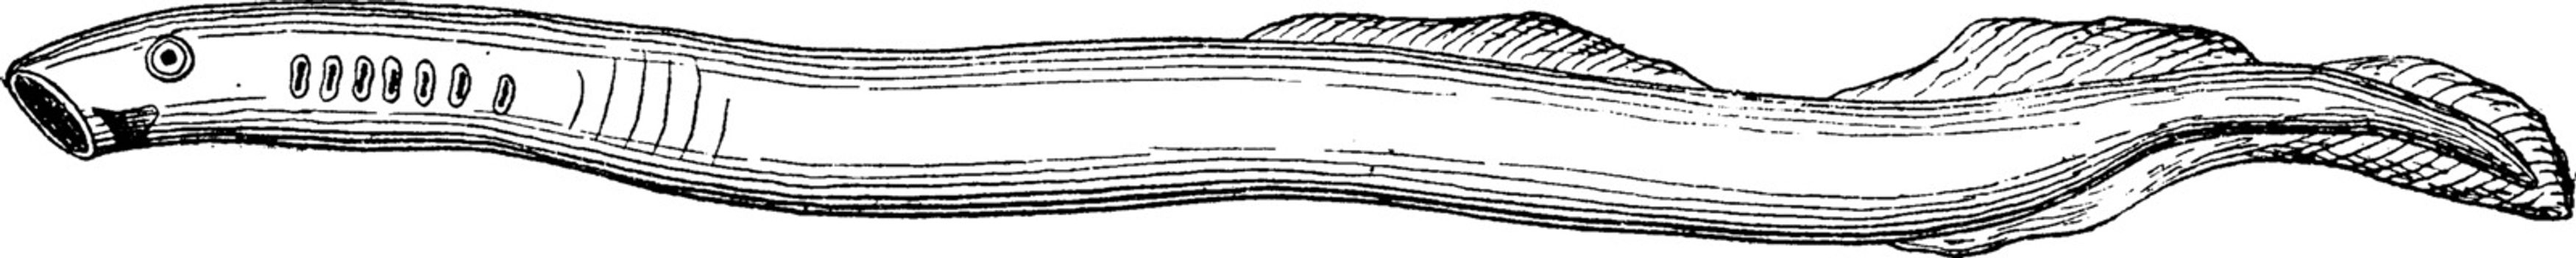 Lamprey rudimentary primitive fish, vintage engraving.